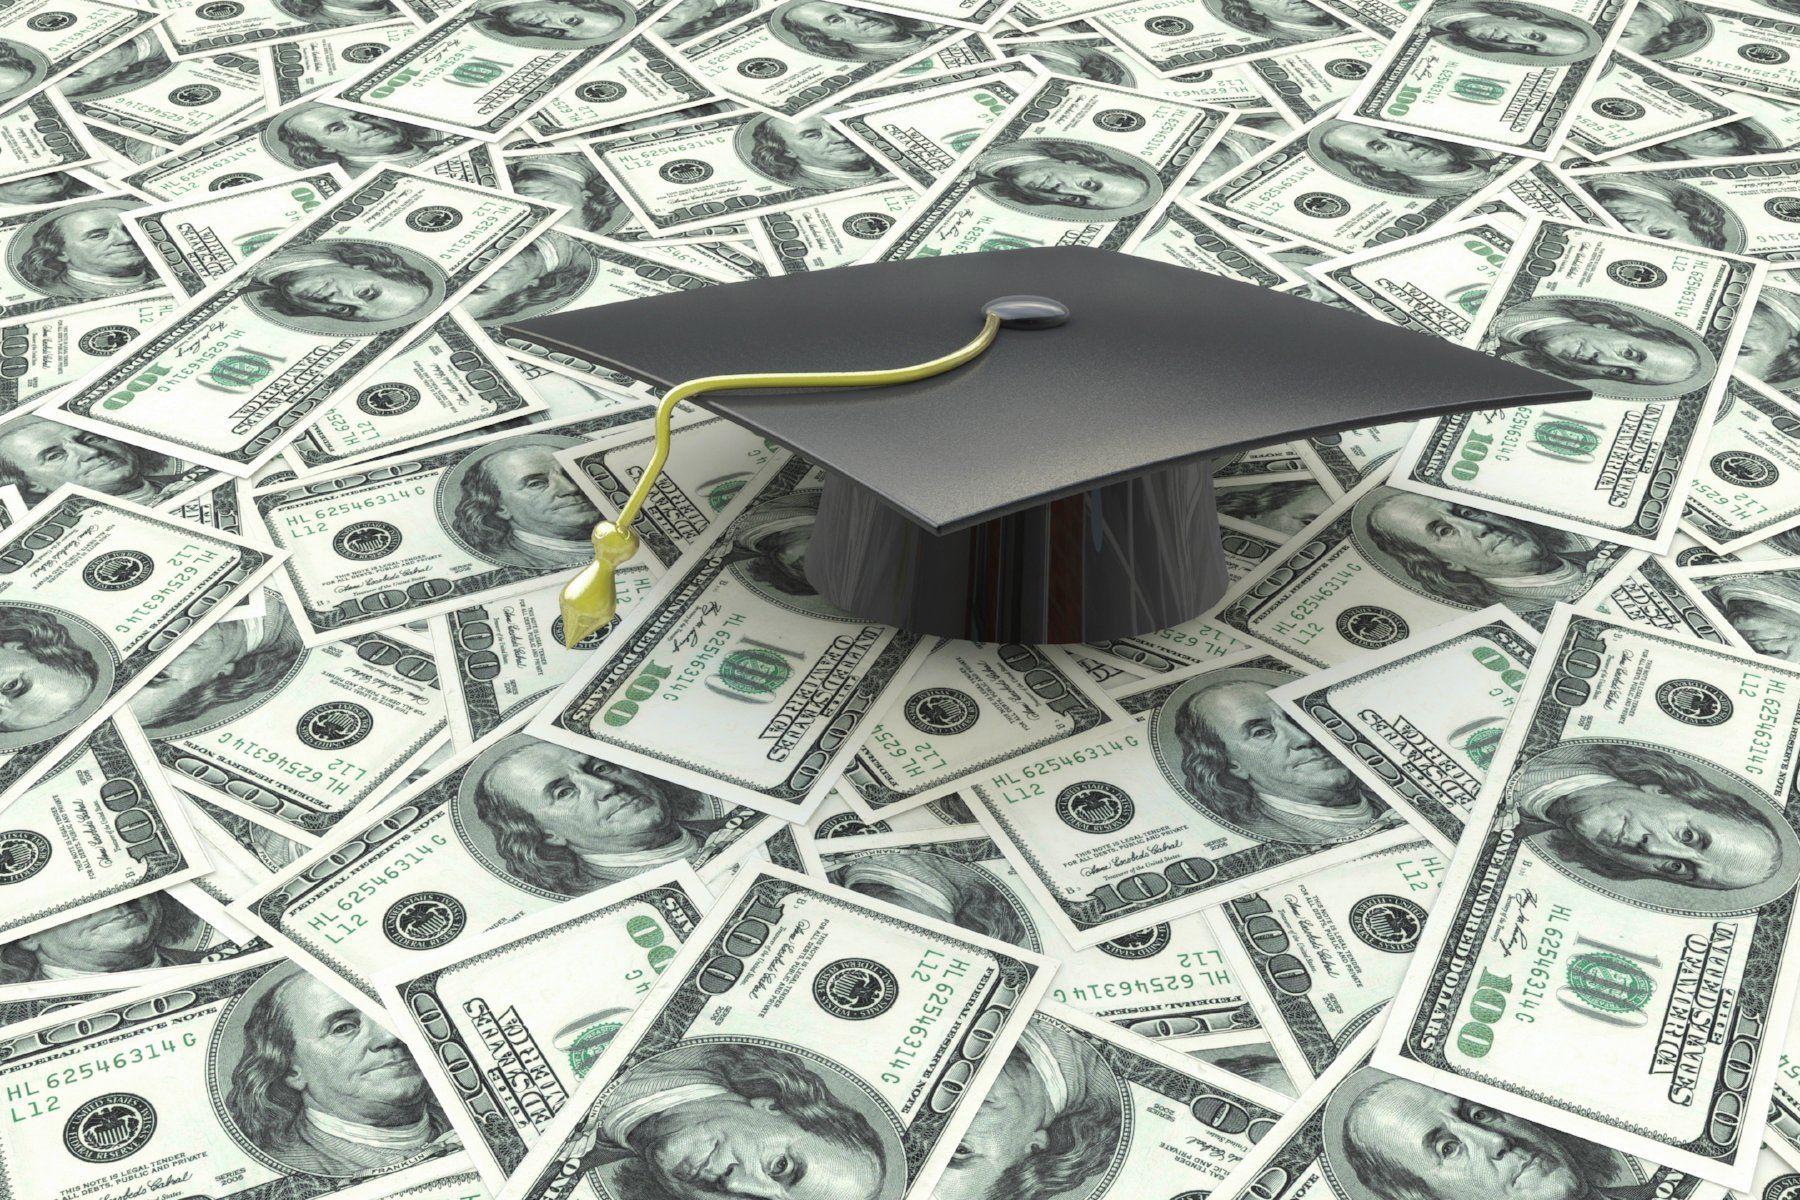 graduation-cap-mortarboard-money-cash-1800-28-mar-2017-money